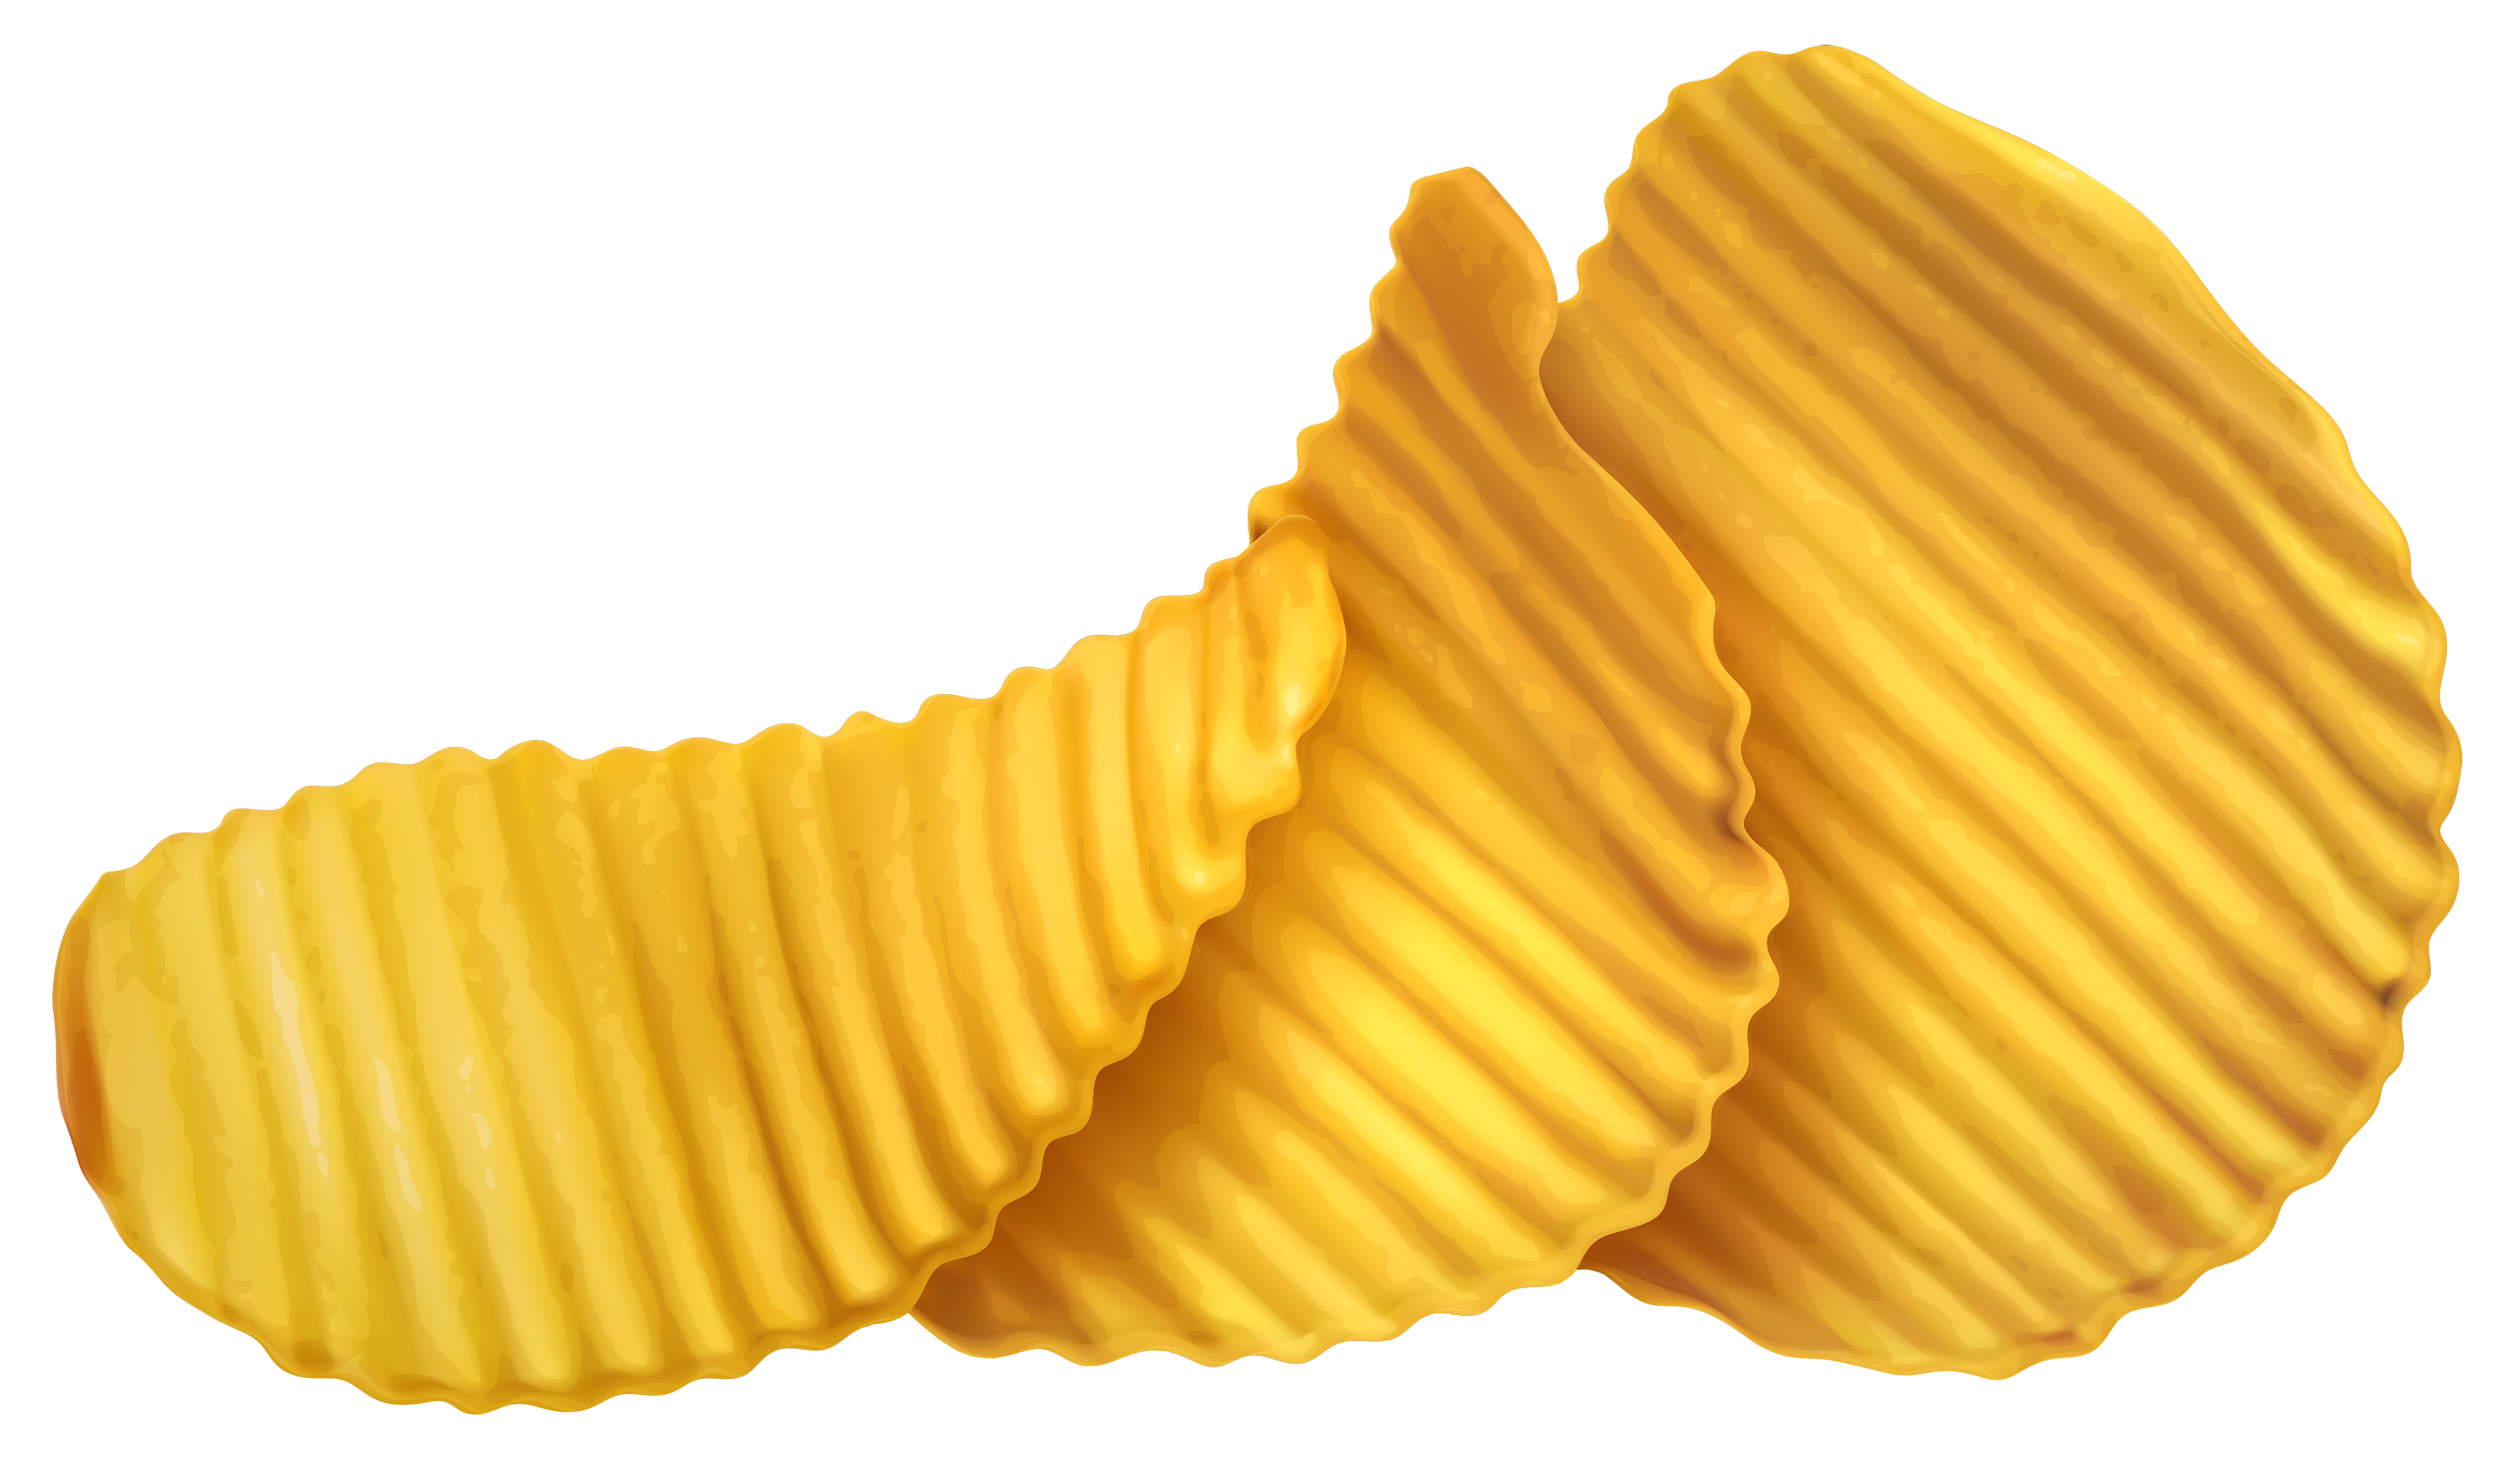 Potato Chips clipart Yopriceville Download Chips Fullsize Vector